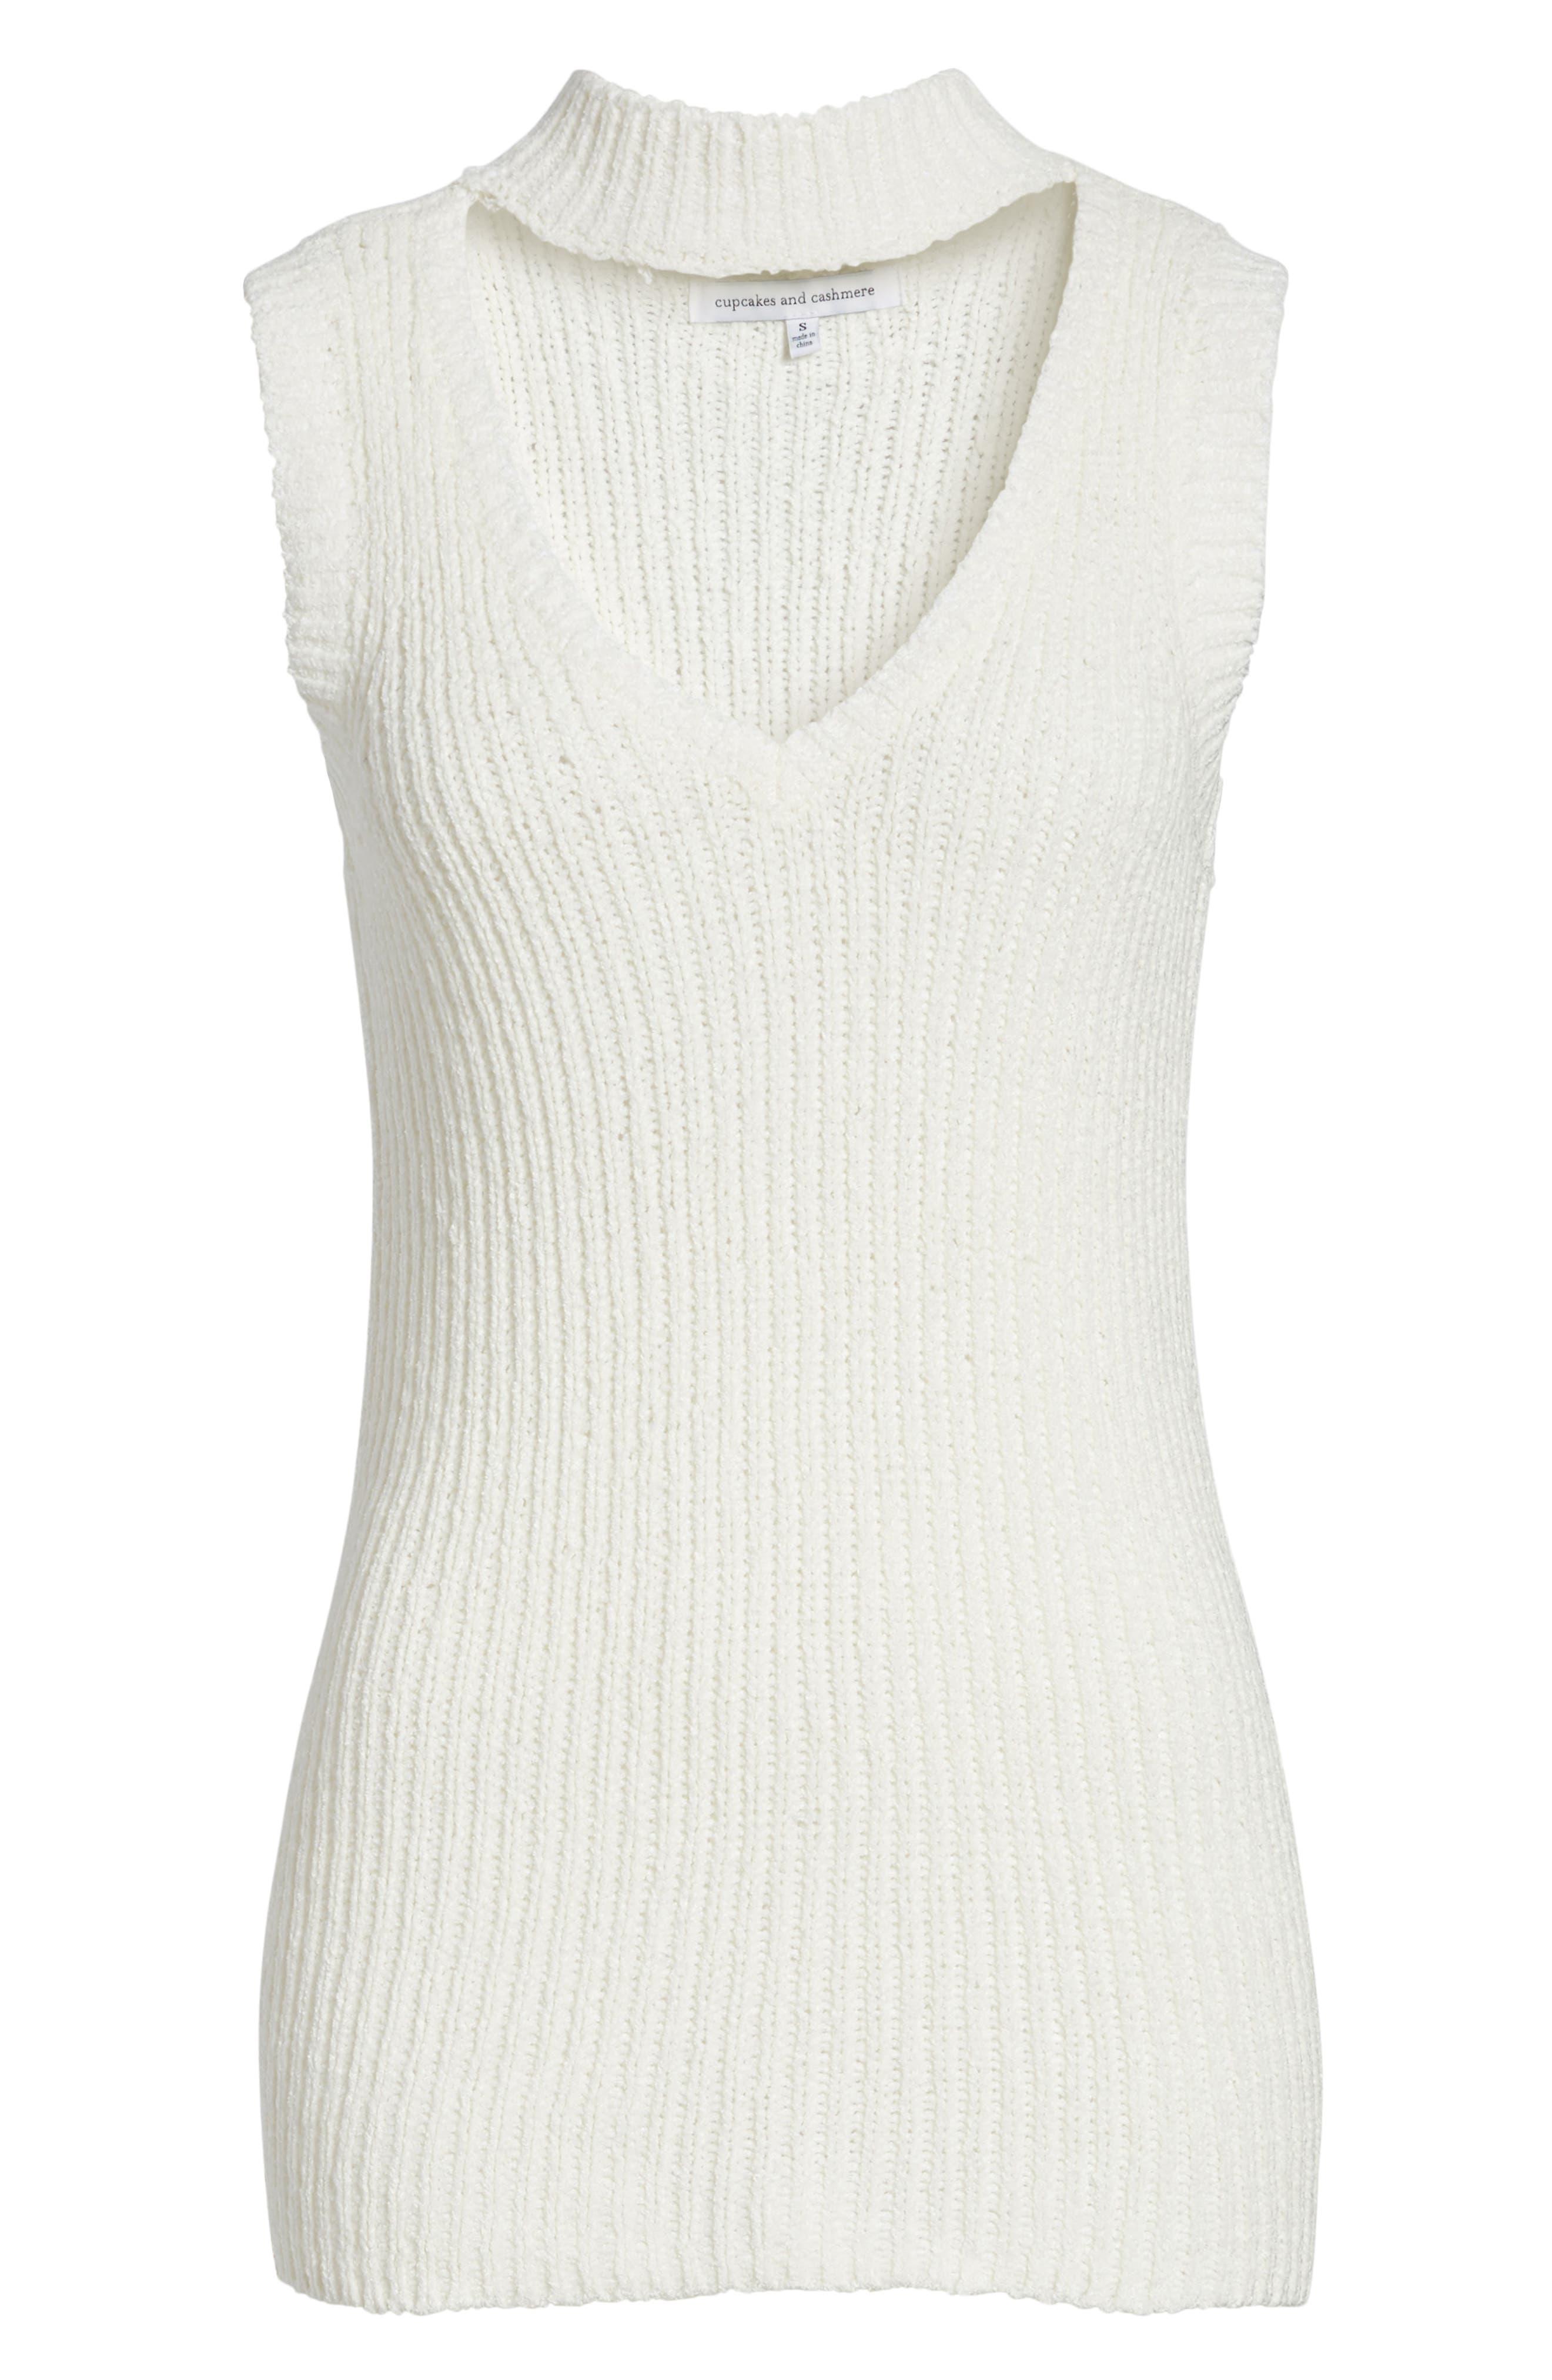 Camdon Sleeveless Sweater,                             Alternate thumbnail 7, color,                             900